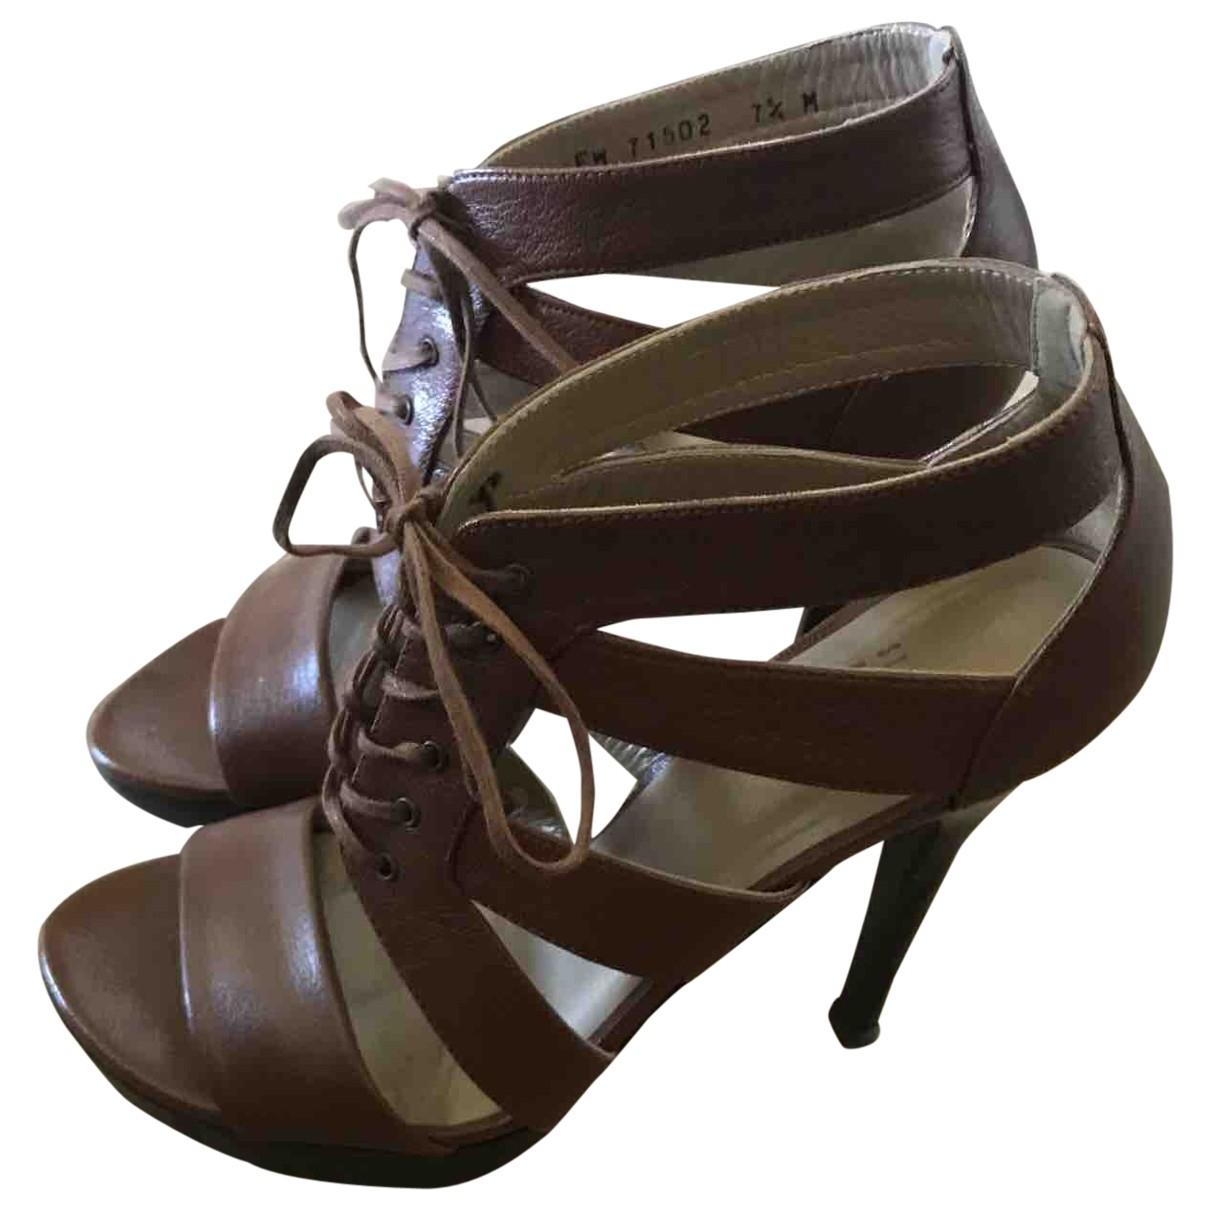 Stuart Weitzman \N Camel Leather Sandals for Women 7.5 US